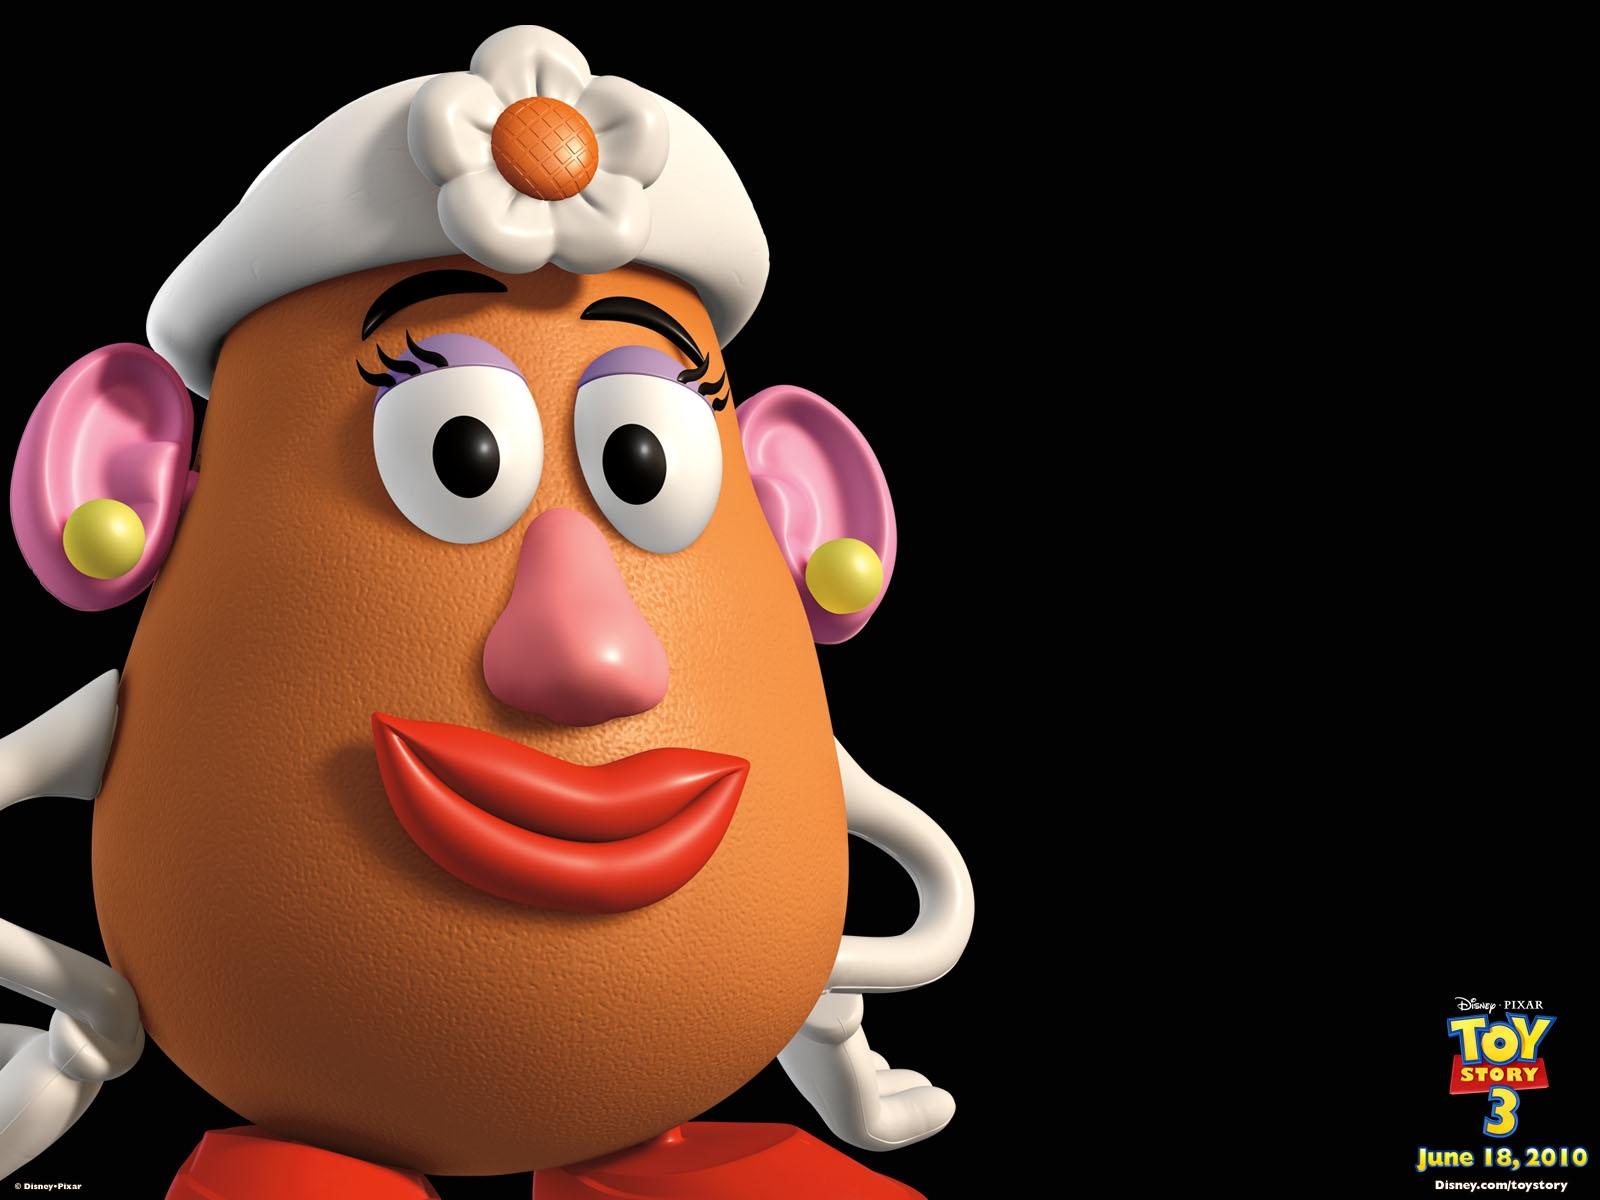 mrs potato head toy story 1 2 3 free hd wallpaper